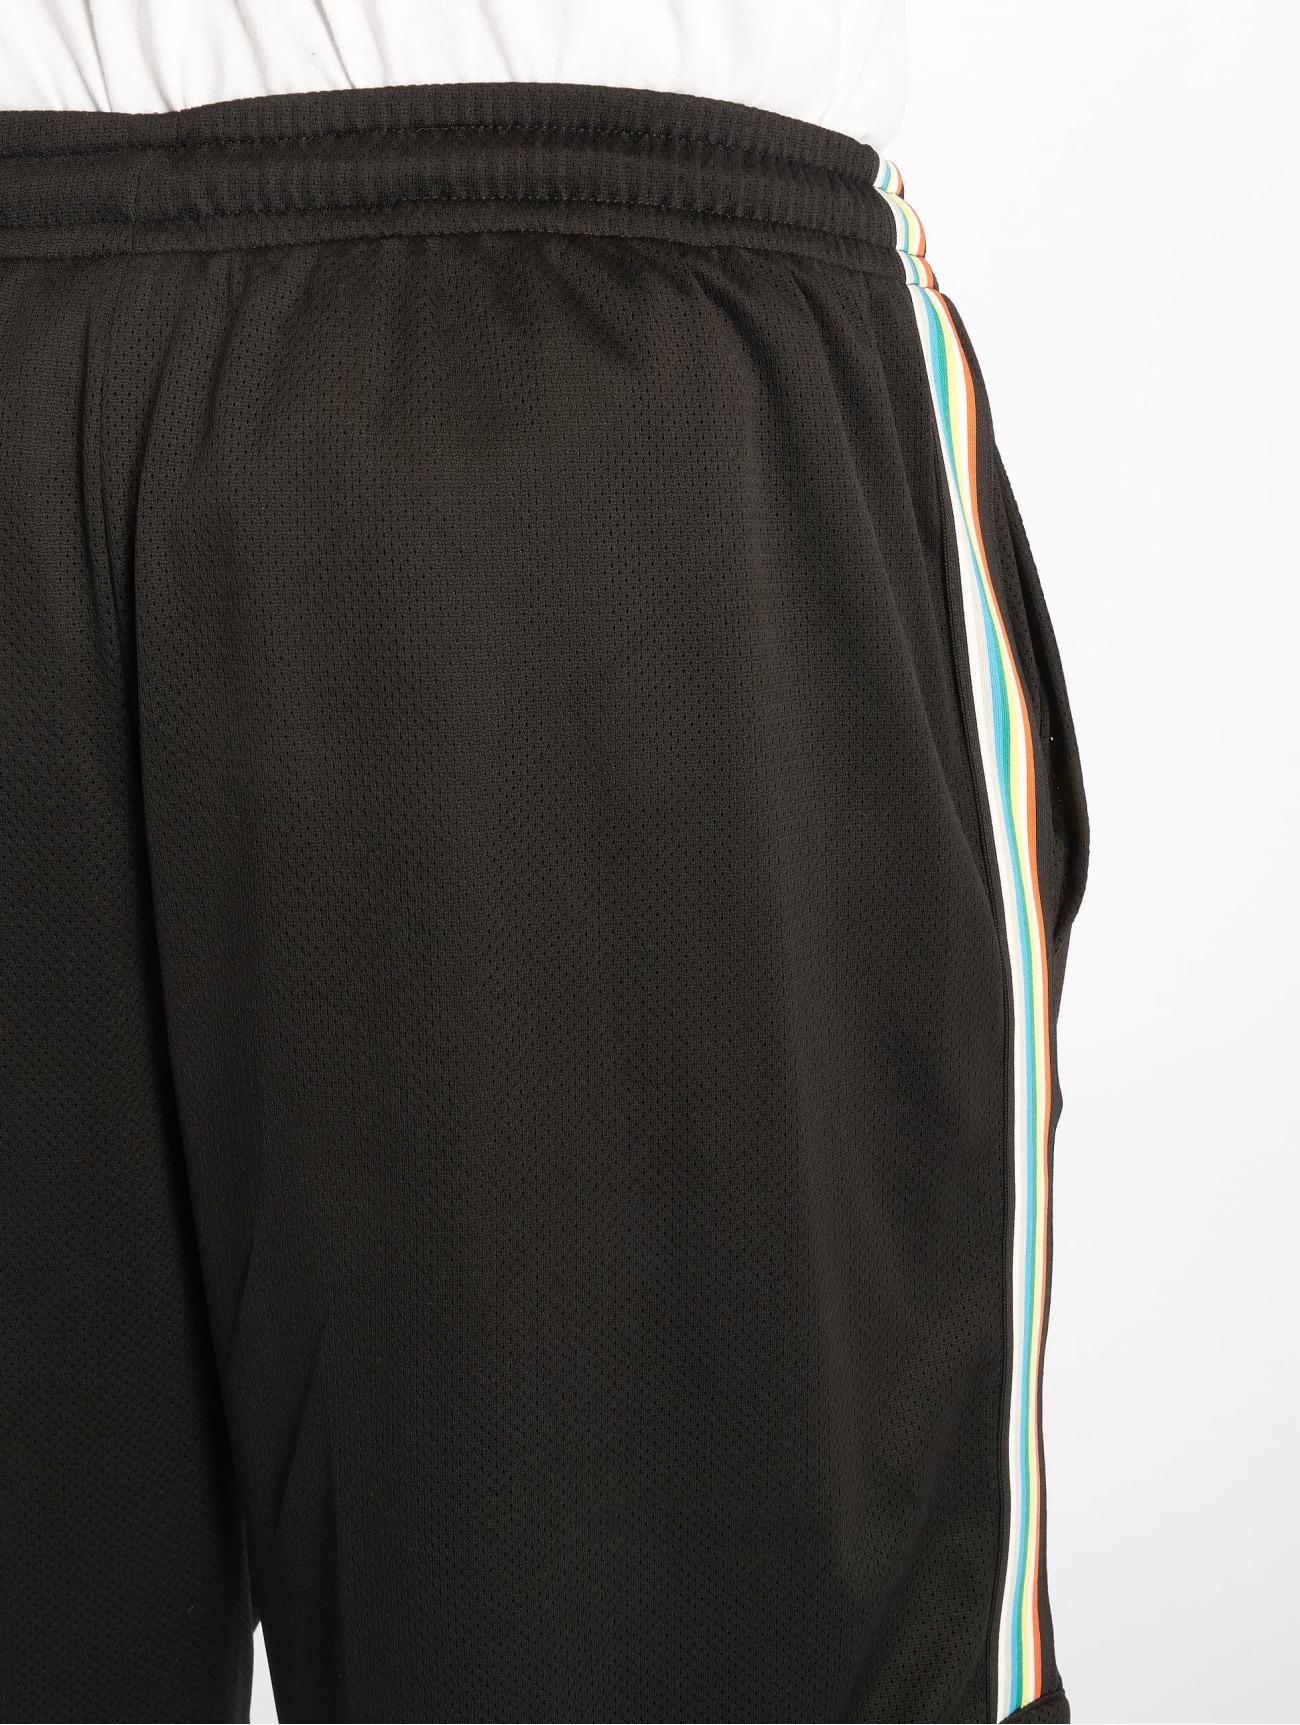 Urban Classics  Side Taped Mesh  noir Homme Short  636225 Homme Pantalons & Shorts